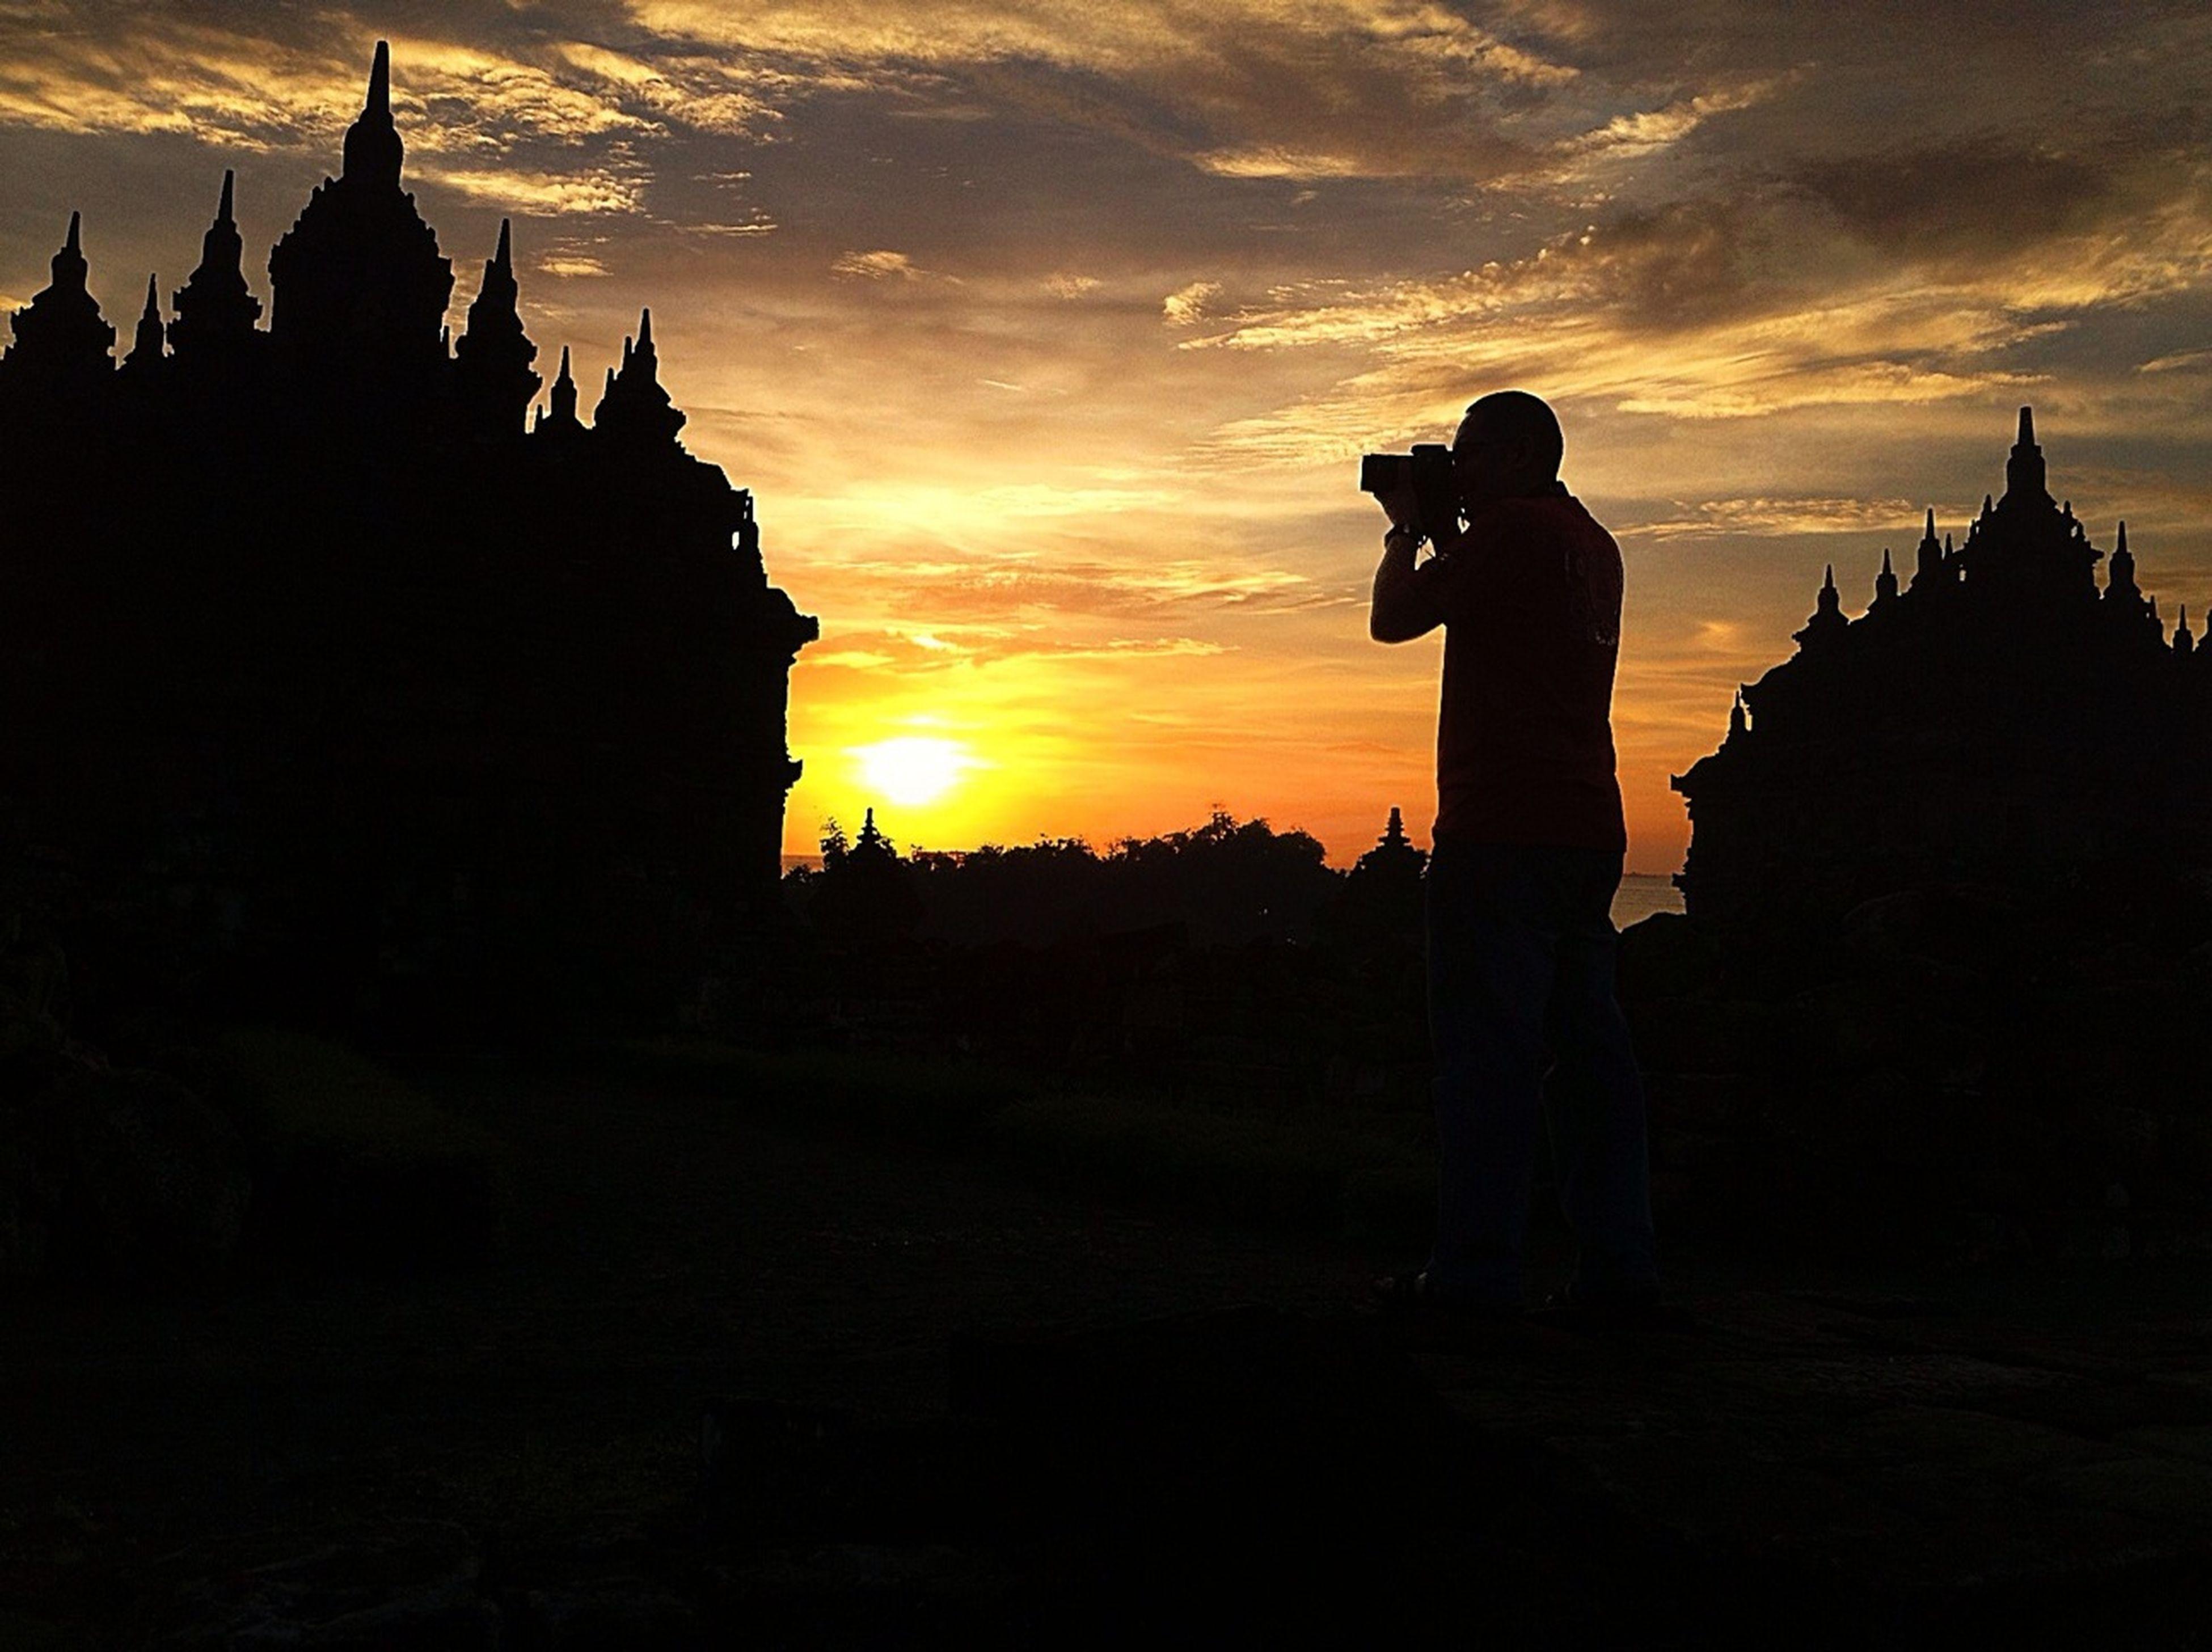 sunset, silhouette, architecture, sky, building exterior, built structure, religion, orange color, place of worship, spirituality, cloud - sky, sun, church, outline, dark, dusk, scenics, dramatic sky